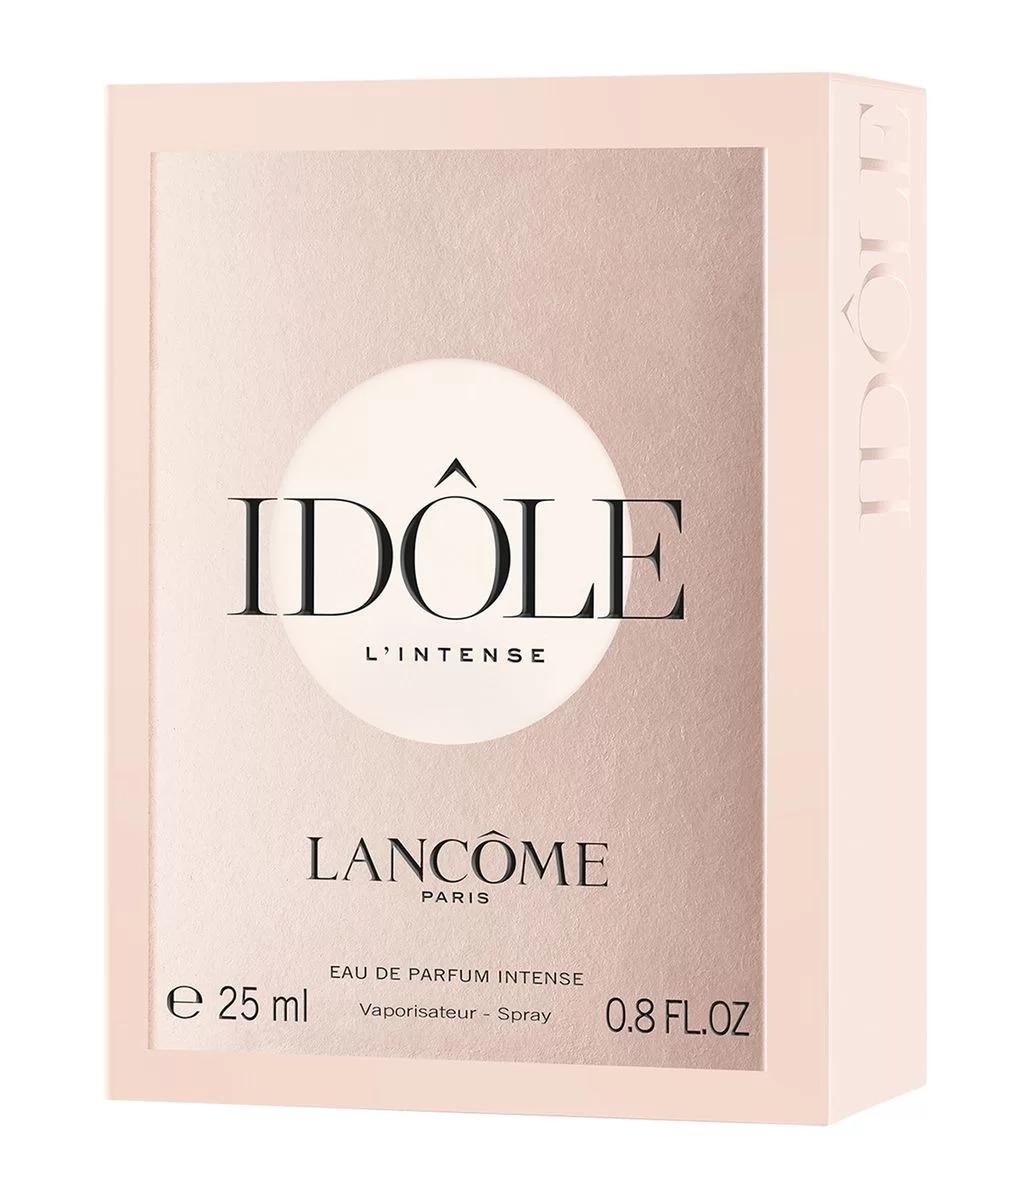 Idôle L'Intense Lancôme Feminino Eau de Parfum Intense 25ml